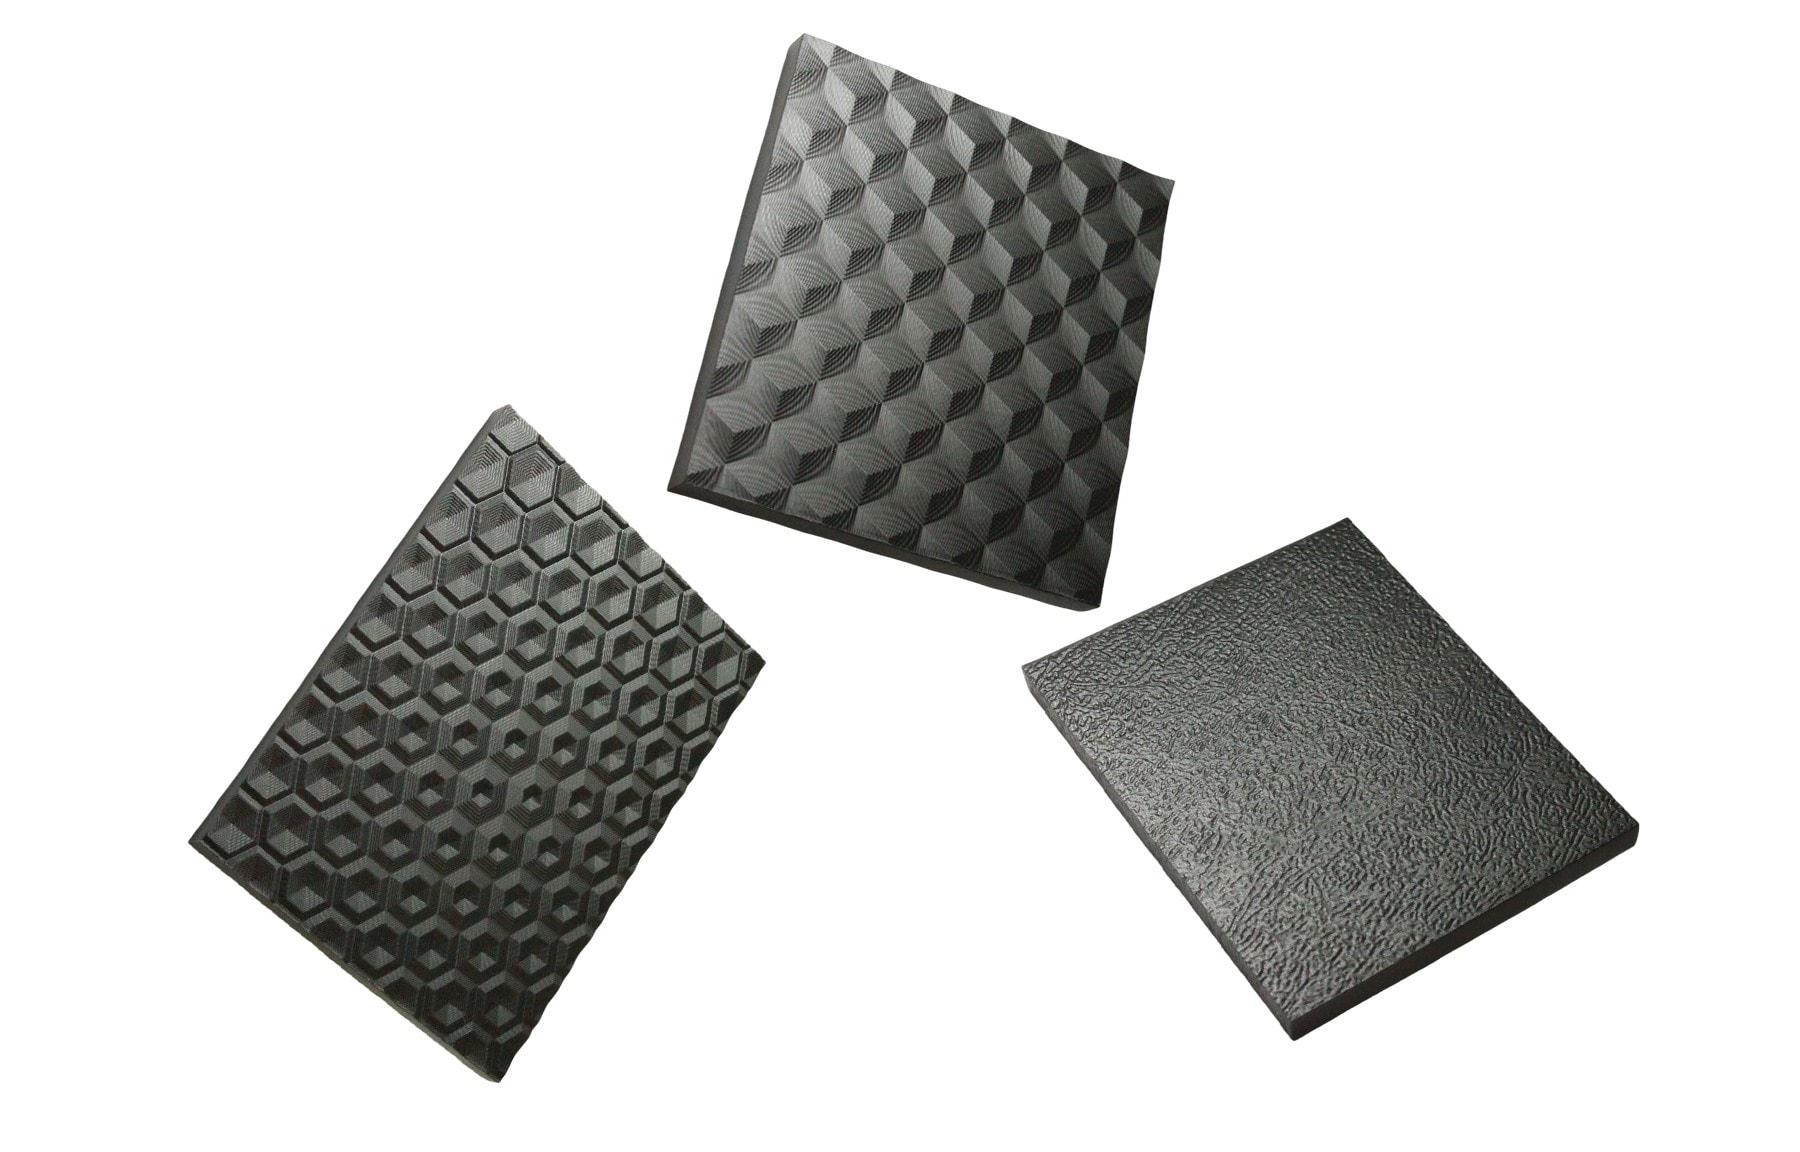 3D print textures